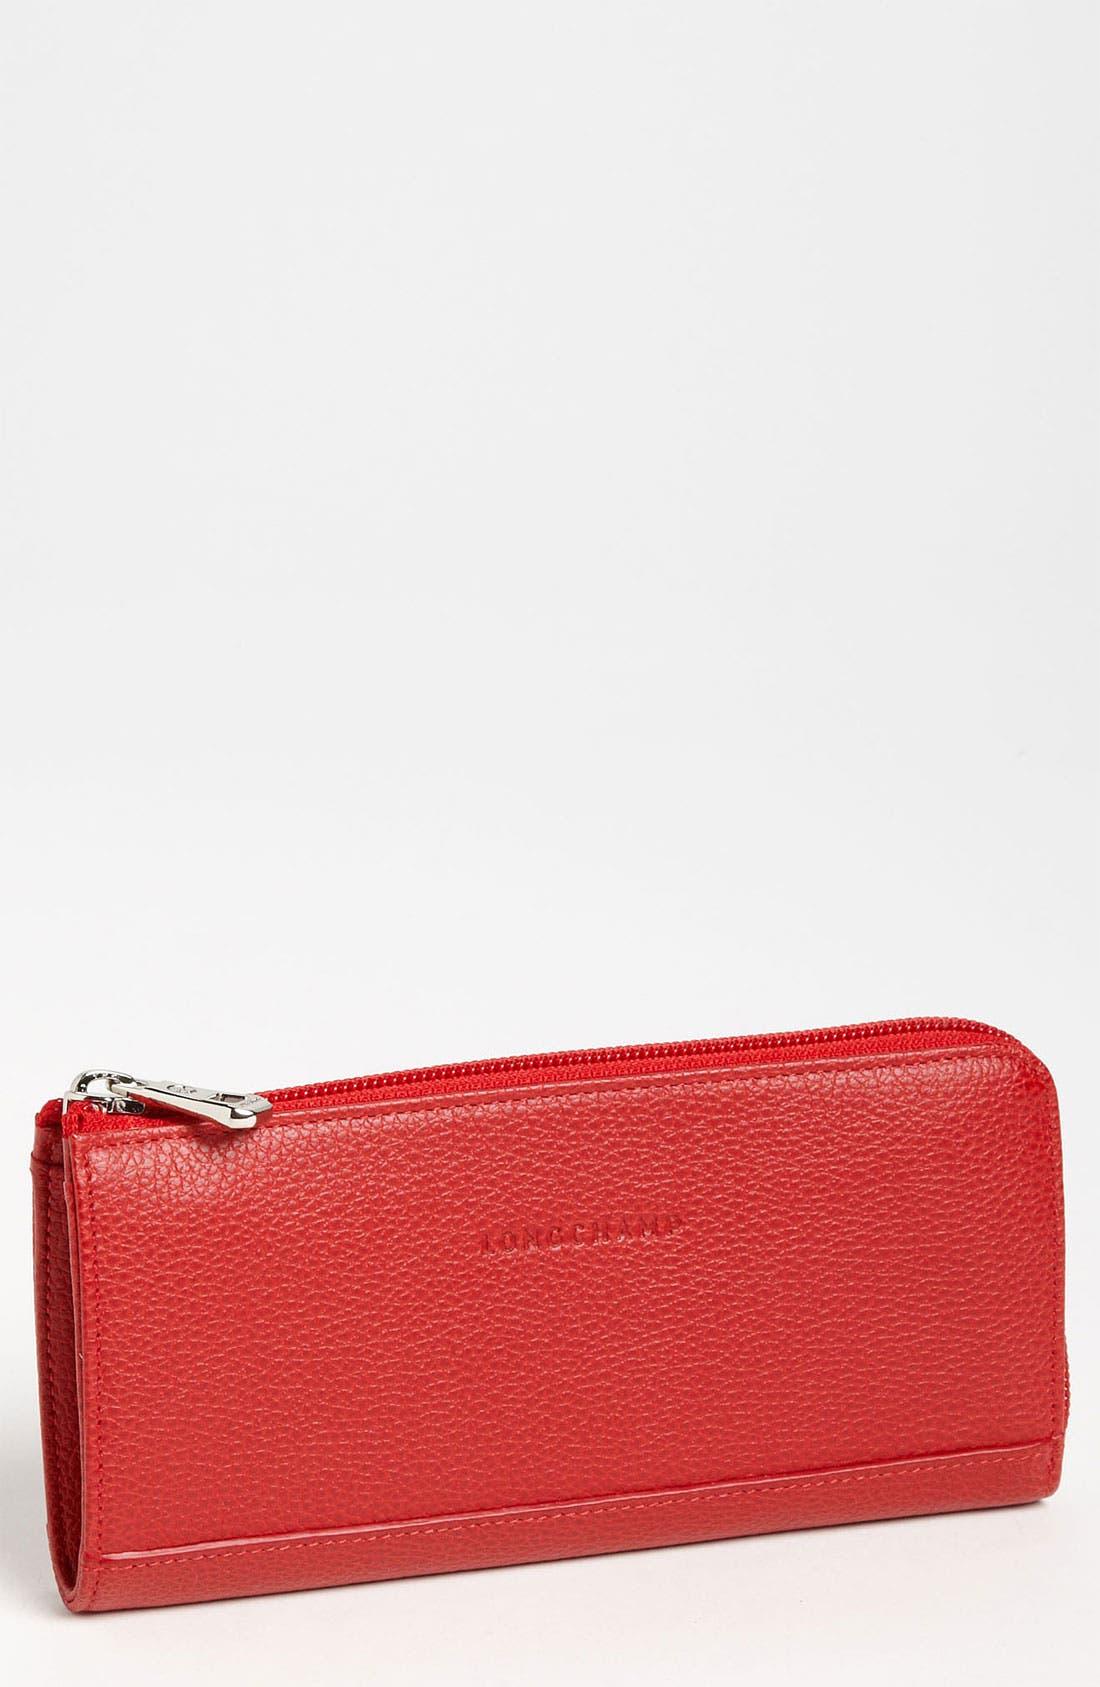 Alternate Image 1 Selected - Longchamp Leather Wallet